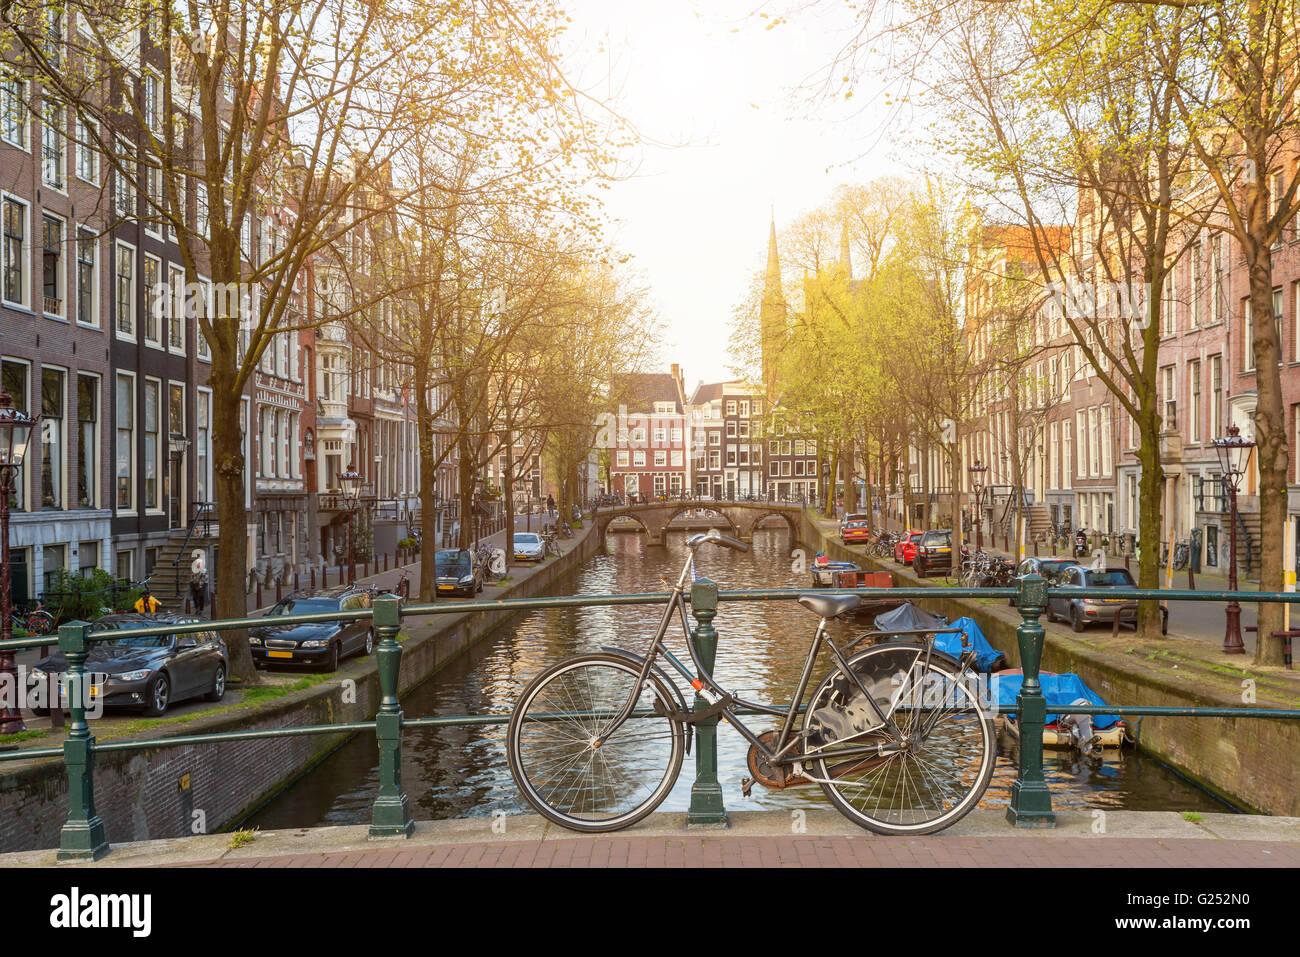 Bikes on the bridge in Amsterdam Netherlands - Stock Image